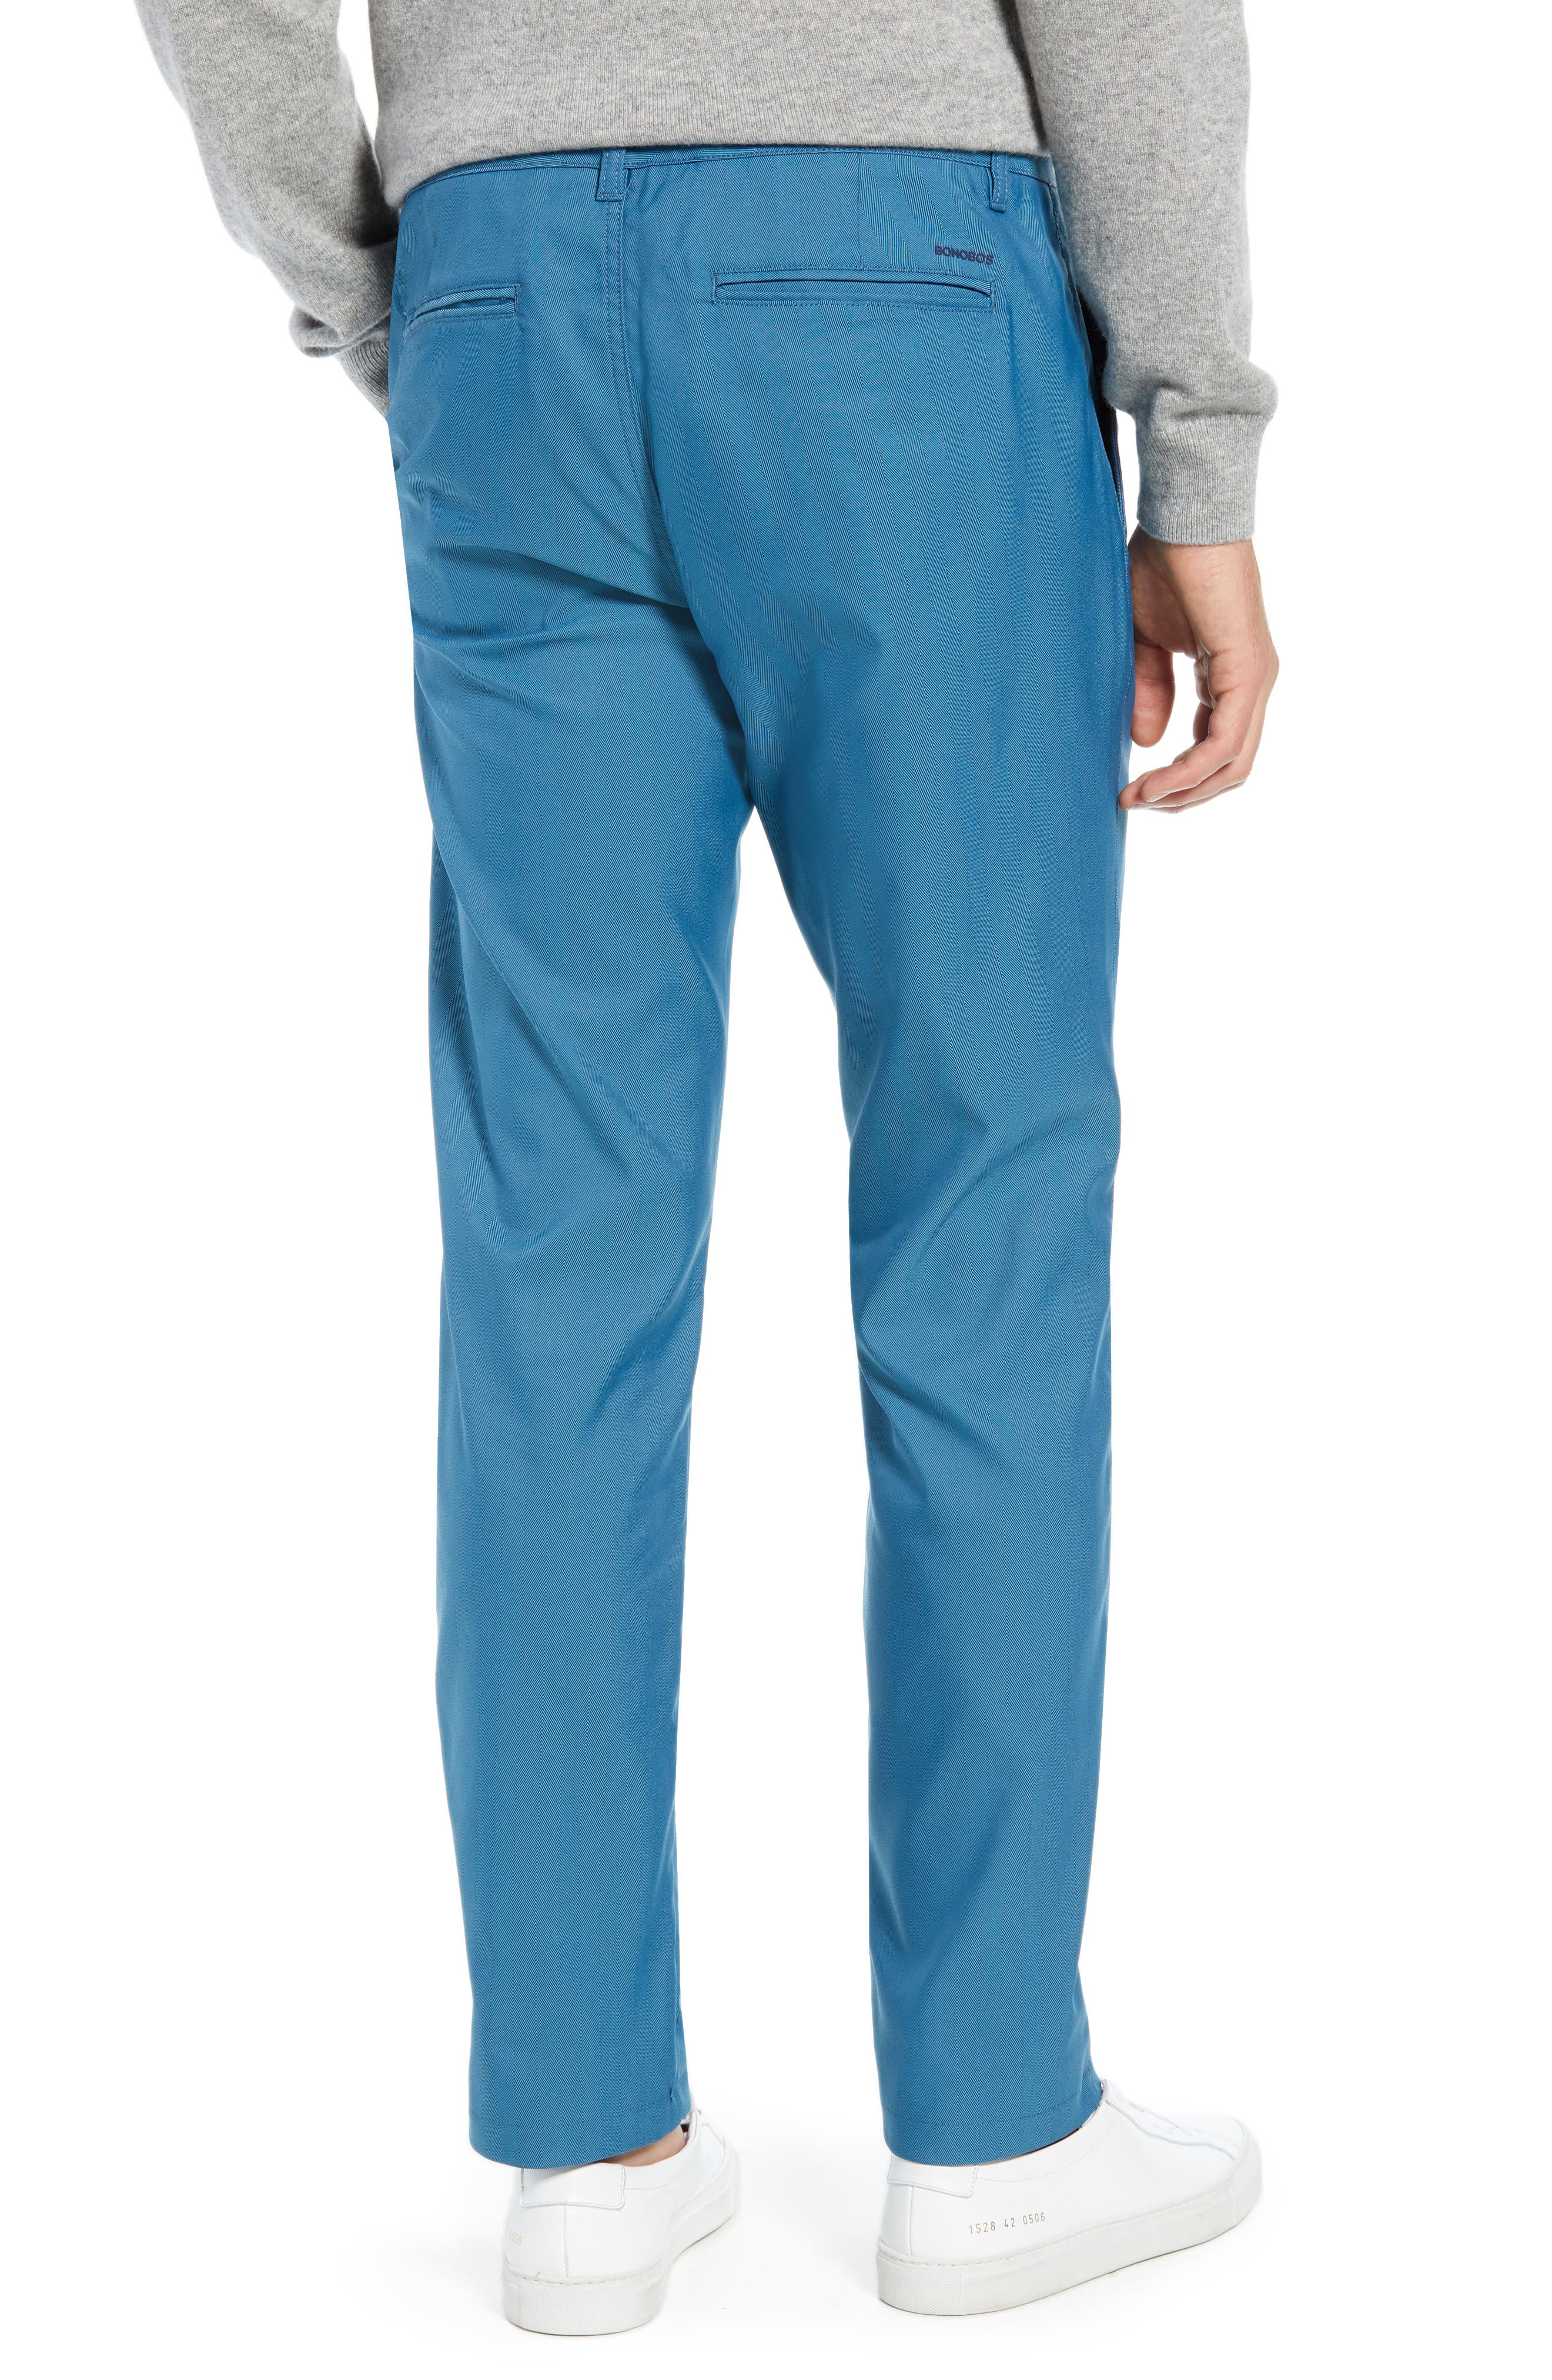 Highland Slim Fit Golf Pants,                             Alternate thumbnail 2, color,                             400